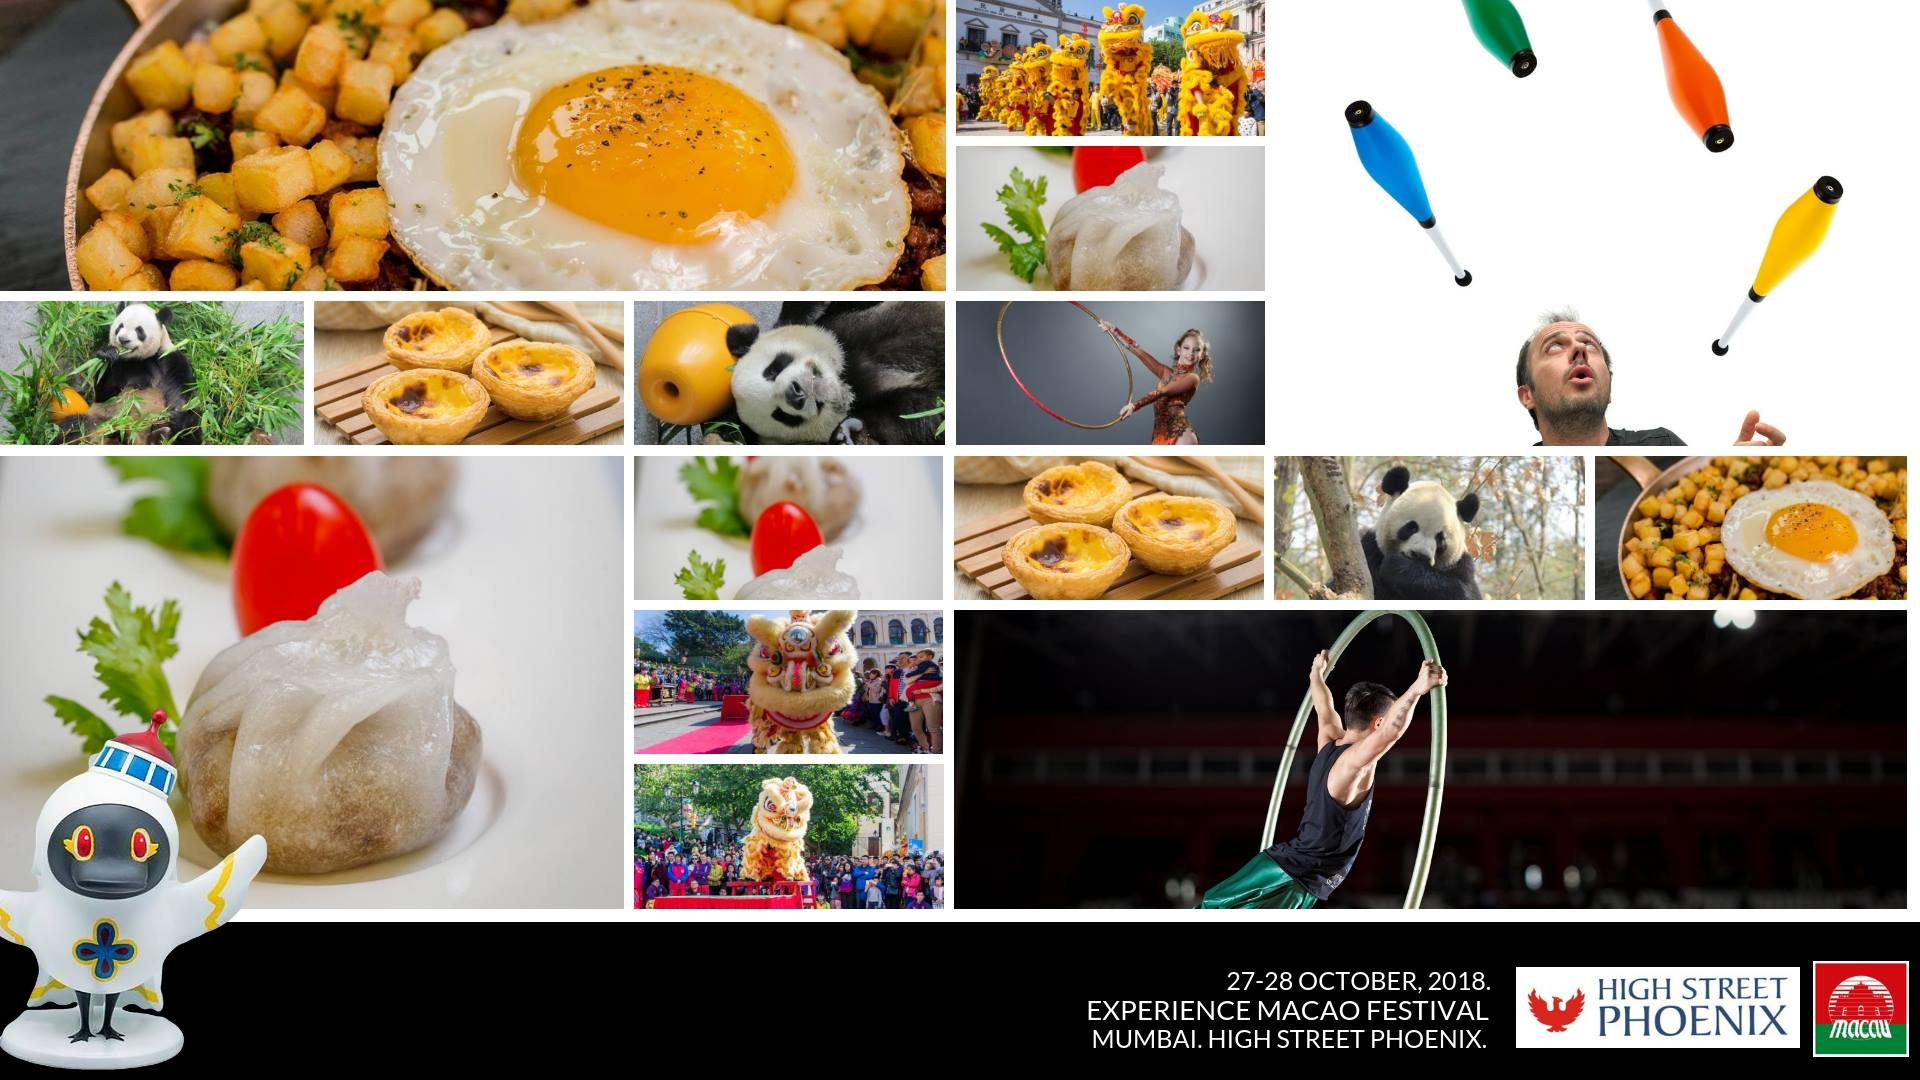 Experience Macao Festival